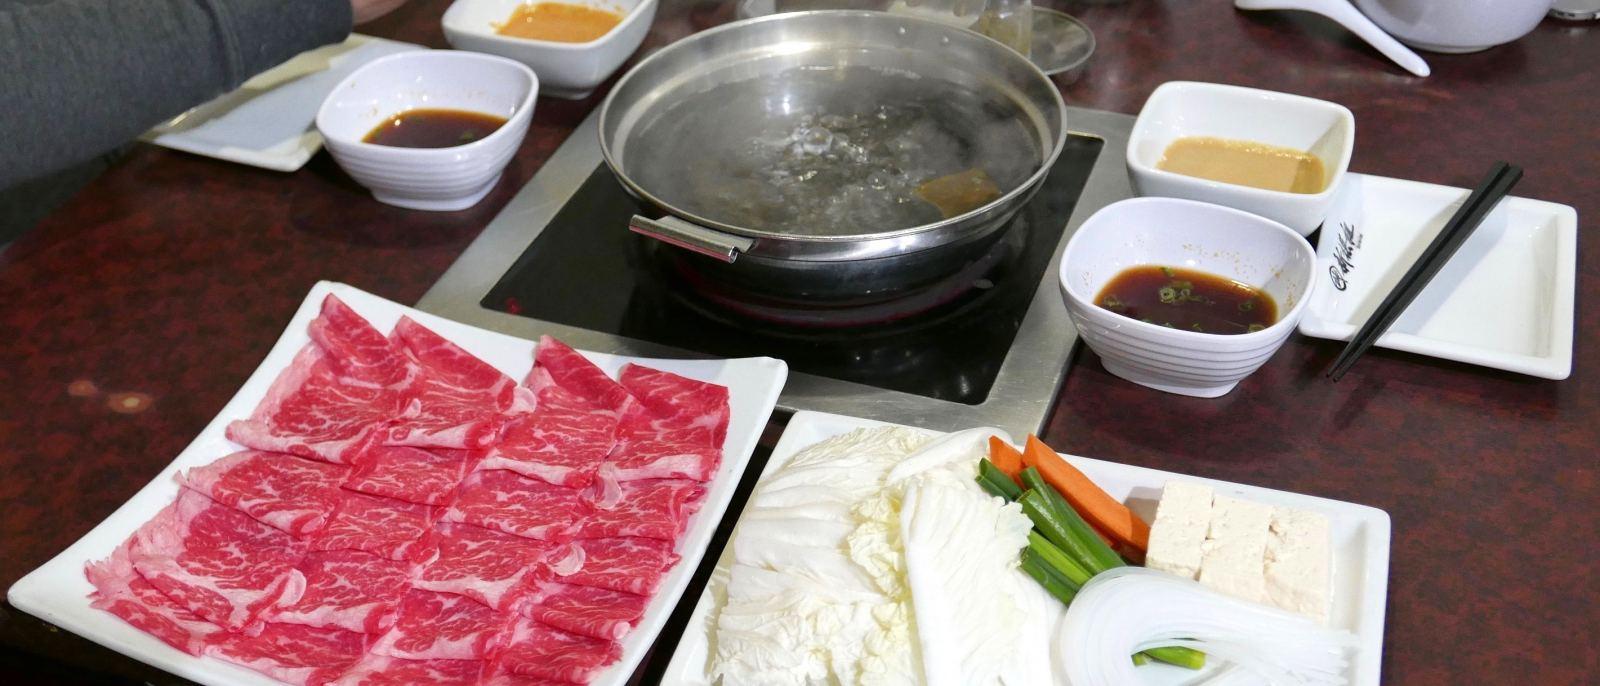 Prime beef flap meat atShin-Sen-Gumi Shabu-Shabu in Gardena